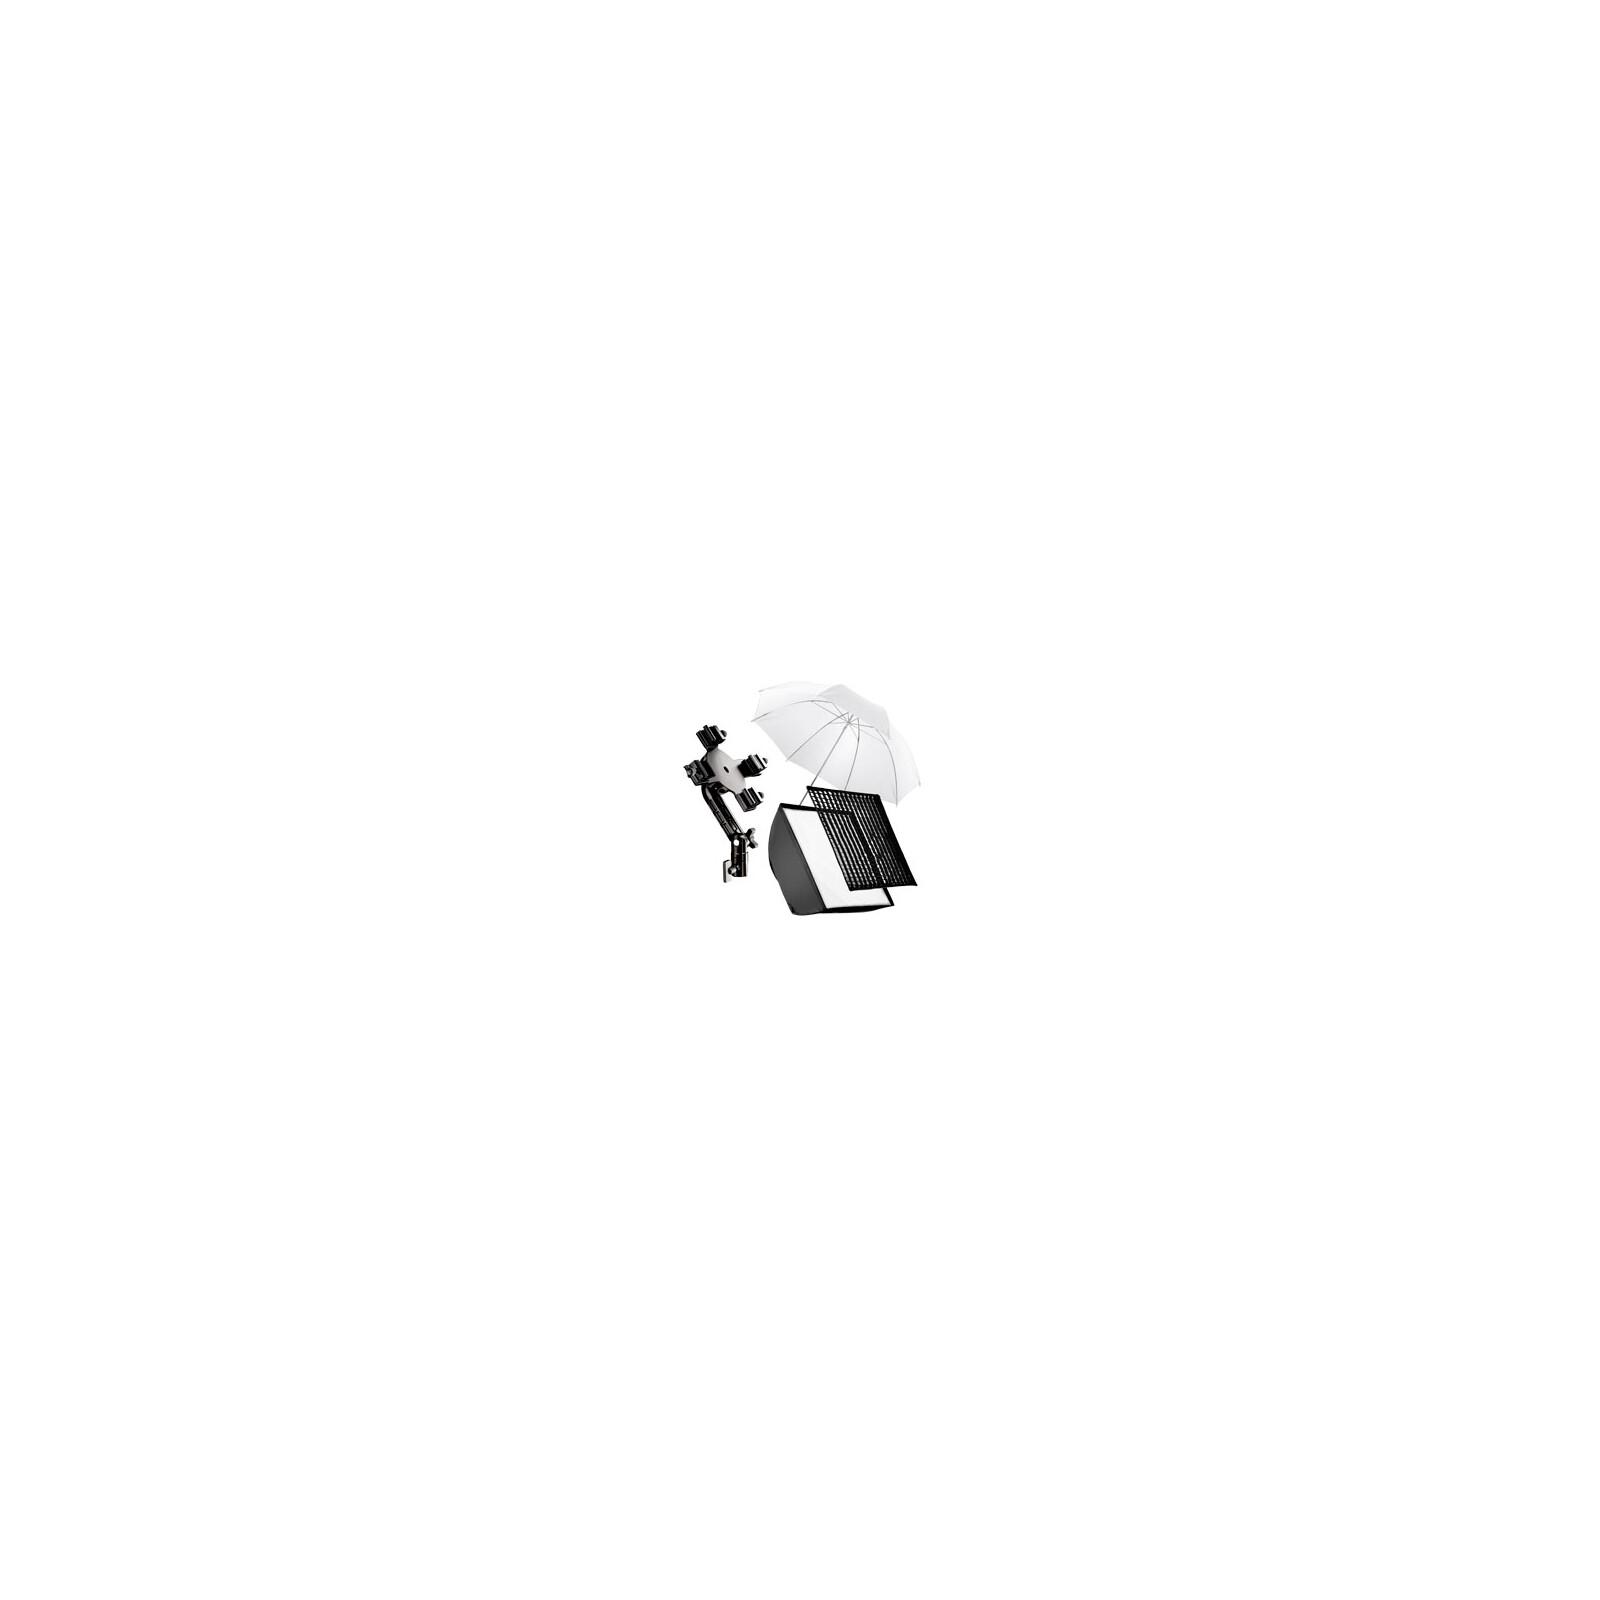 walimex 4f Blitzhalter inkl. SB 60, Schirm weiß